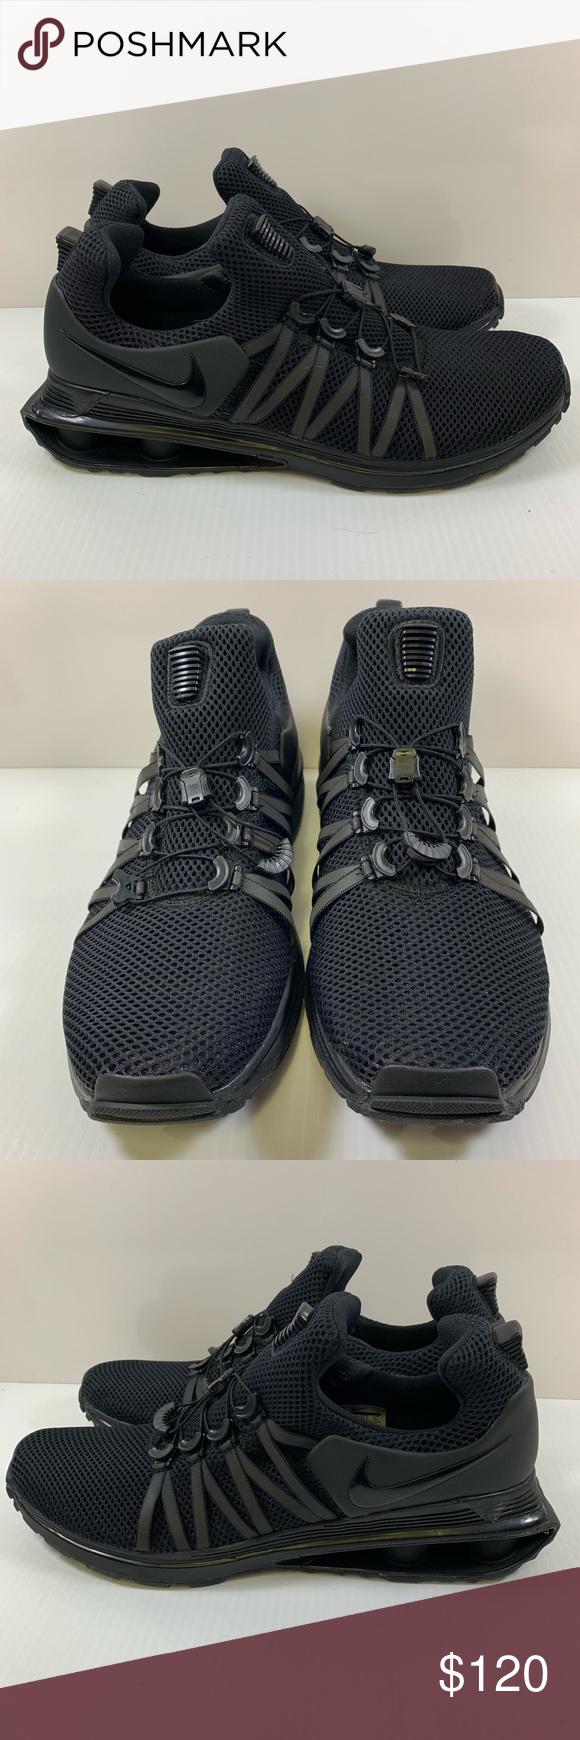 3493bd0cd72 Nike Shox Gravity Men s Sz 13 Black AR1999-001 Nike Shox Gravity Men s  Training Shoes Triple Black Men s size 13 Nike ID  AR1999-001 New without  box 100% ...